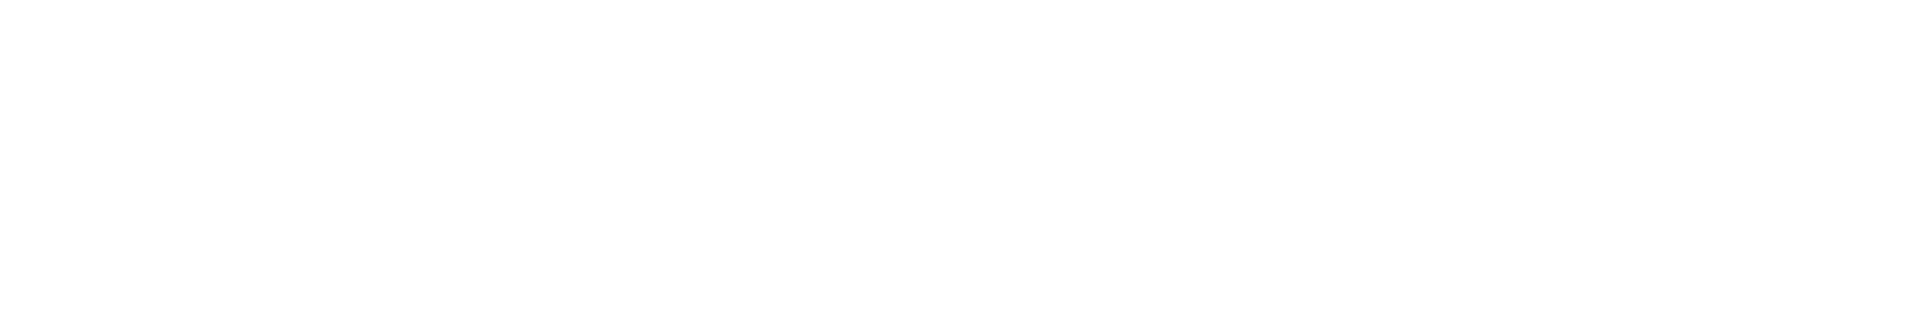 JOEST Logo White